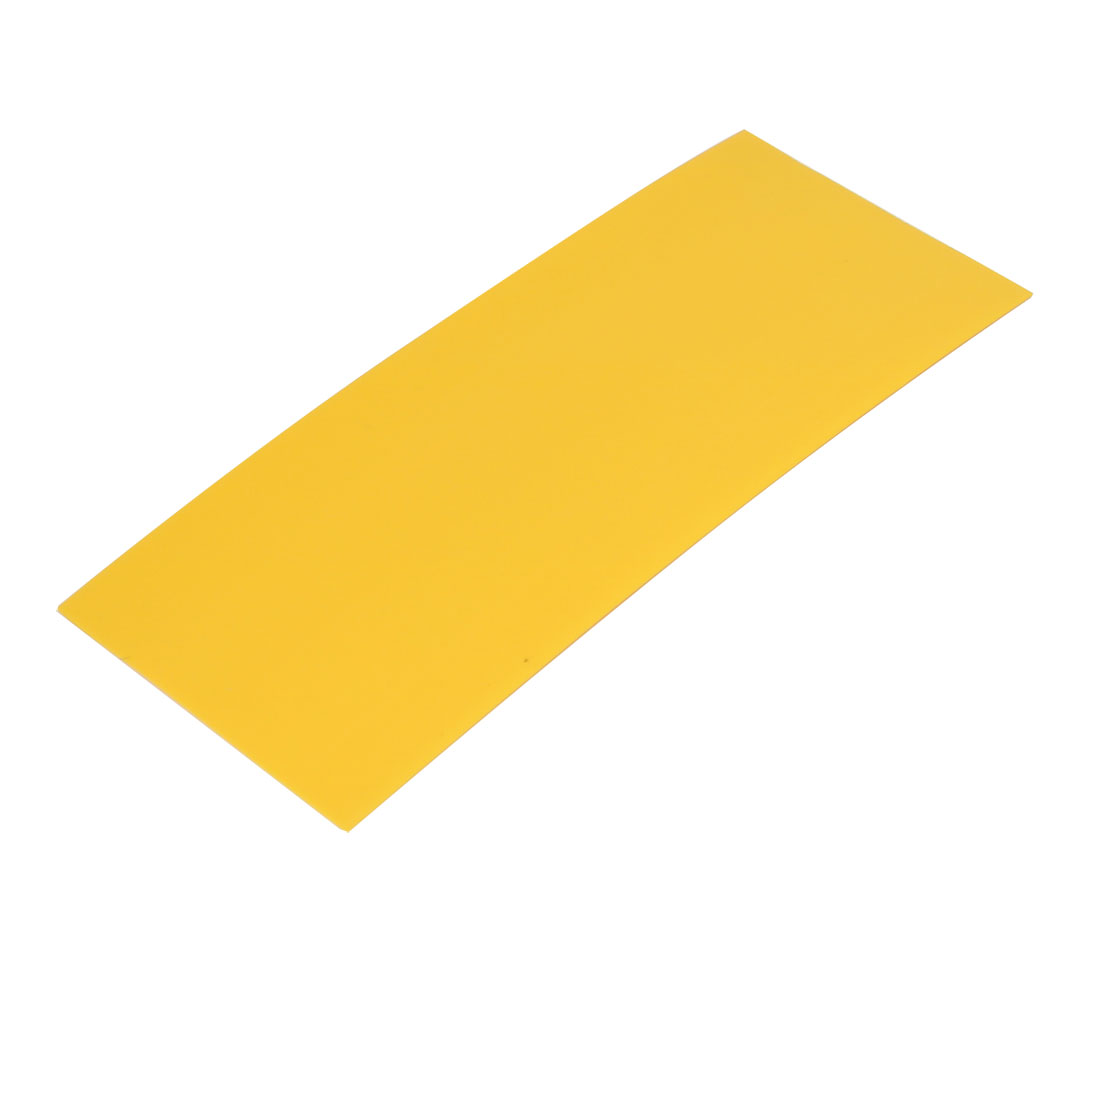 29.5mm Flat Width 72mm Long PVC Heat Shrinkable Tube Yellow for 18650 Battery